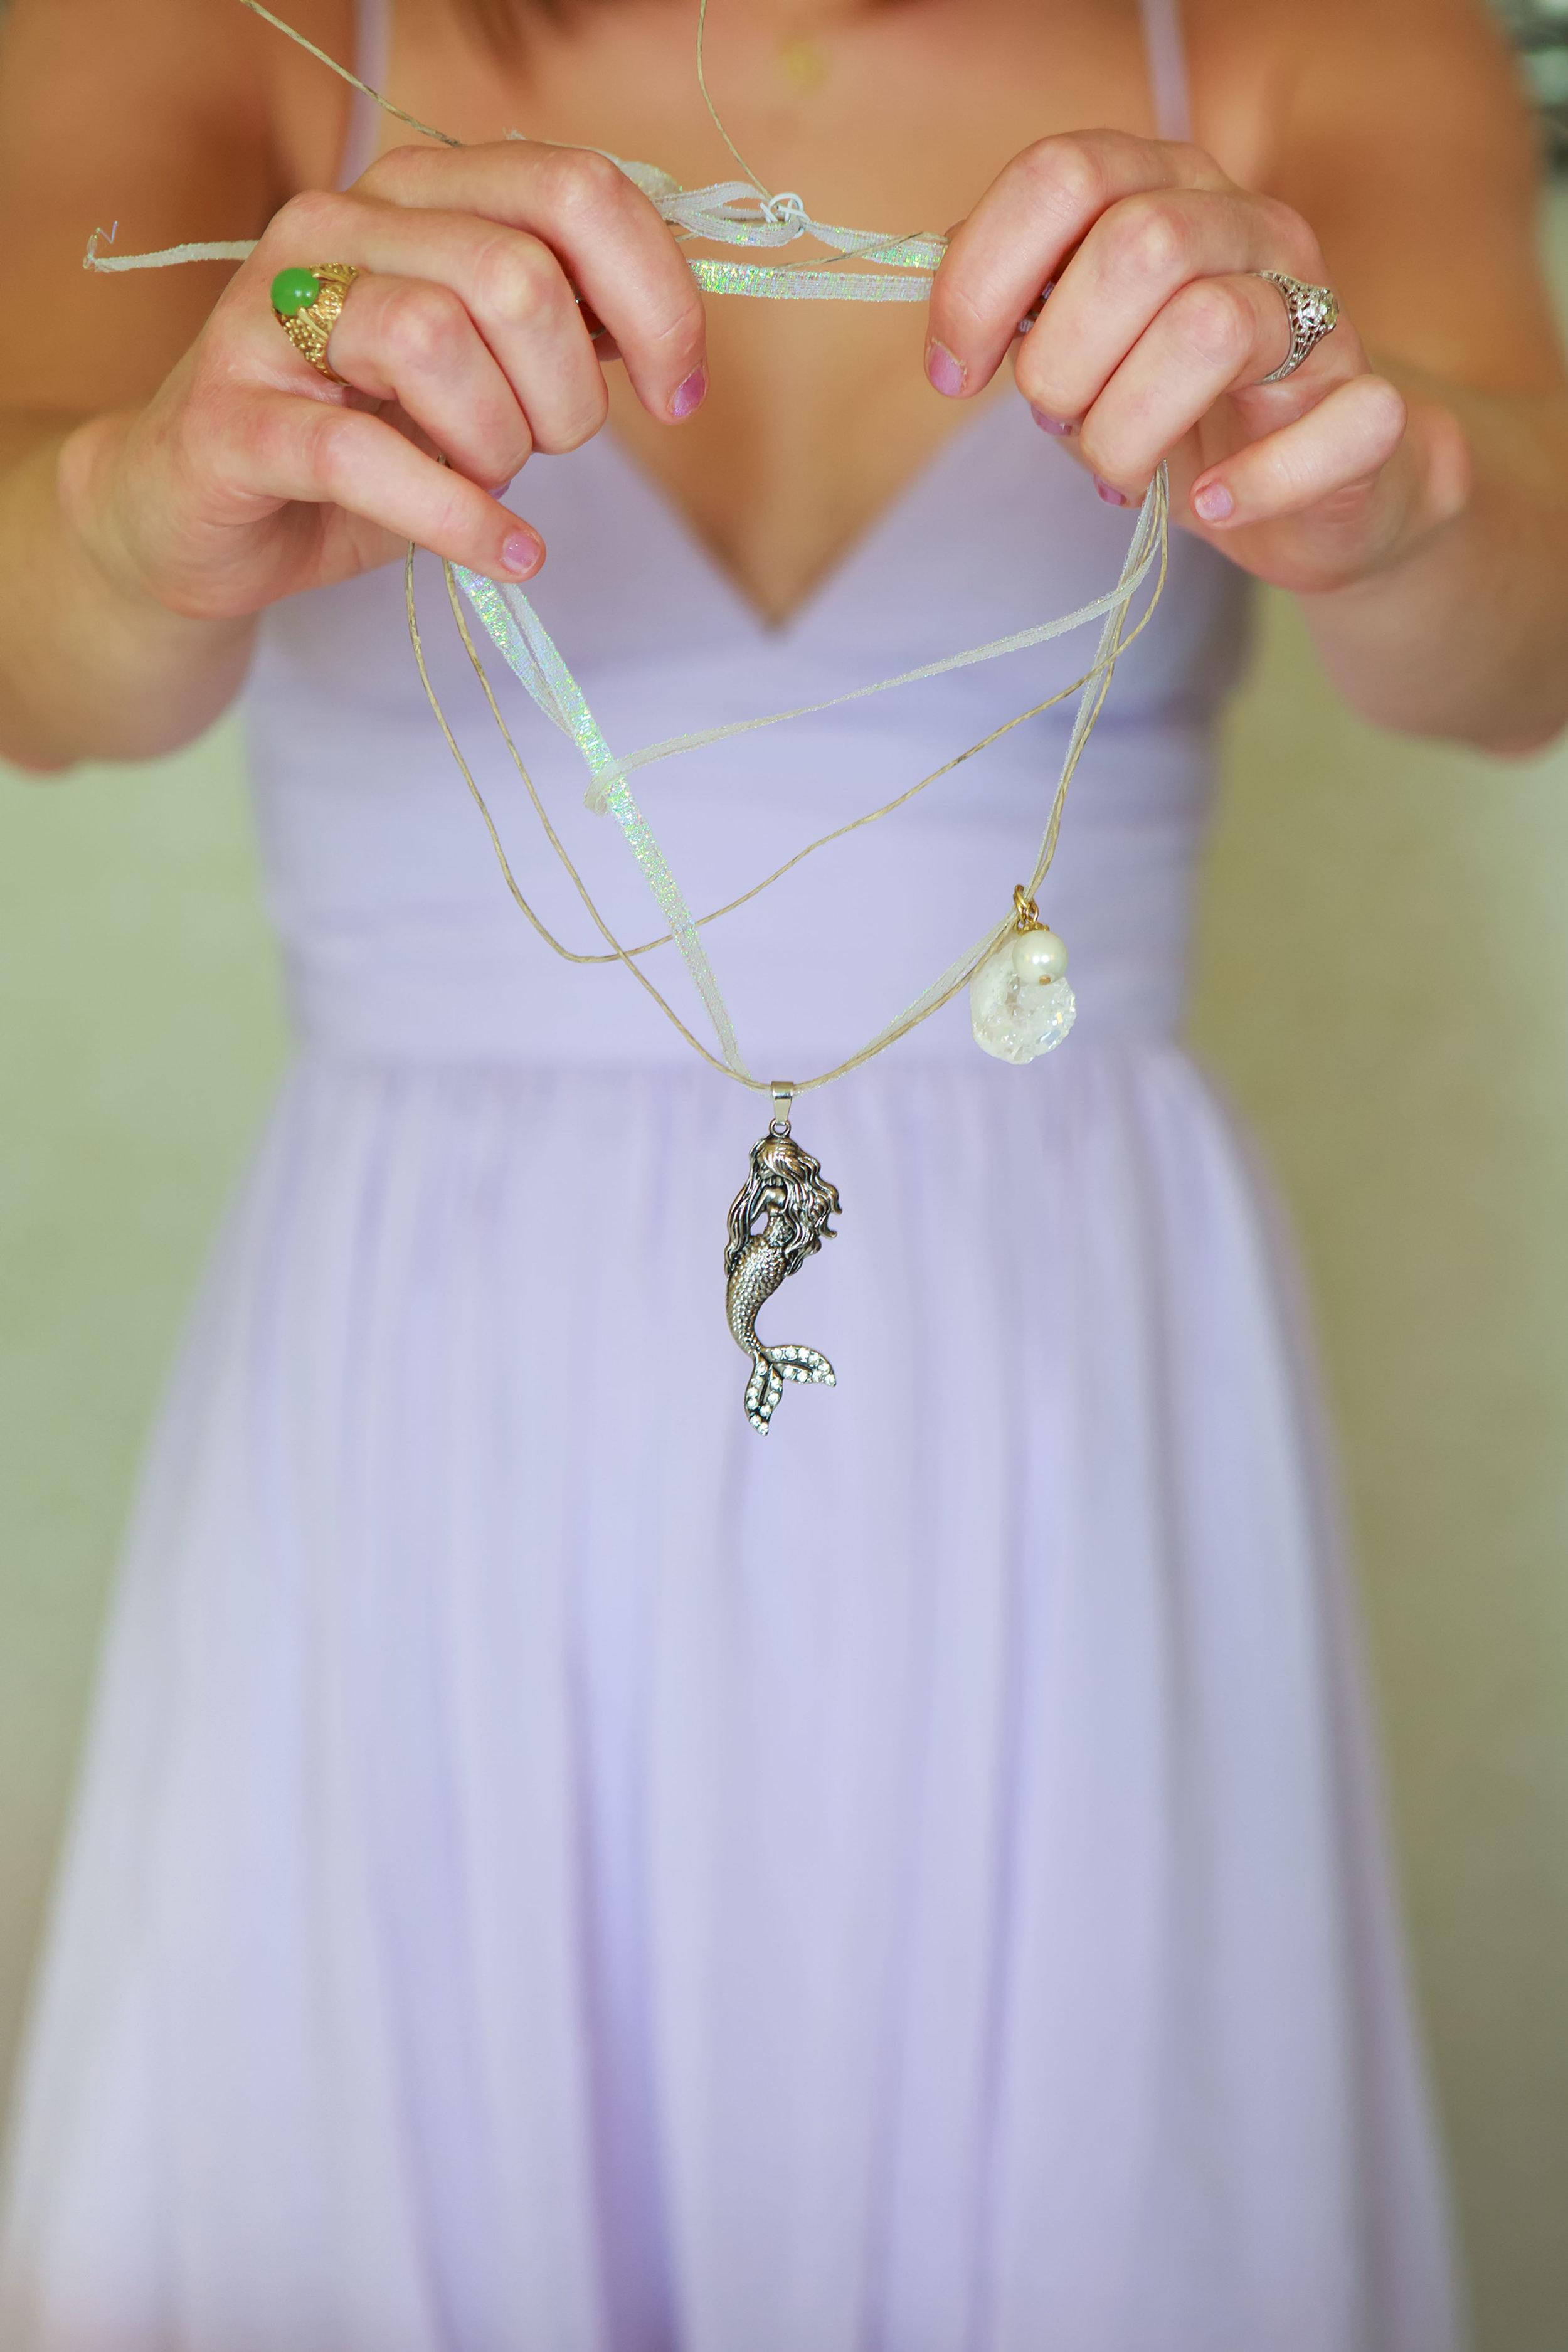 North_Carolina_Wedding_Photographer_Tiffany_Abruzzo_Girls Prep_011.jpg